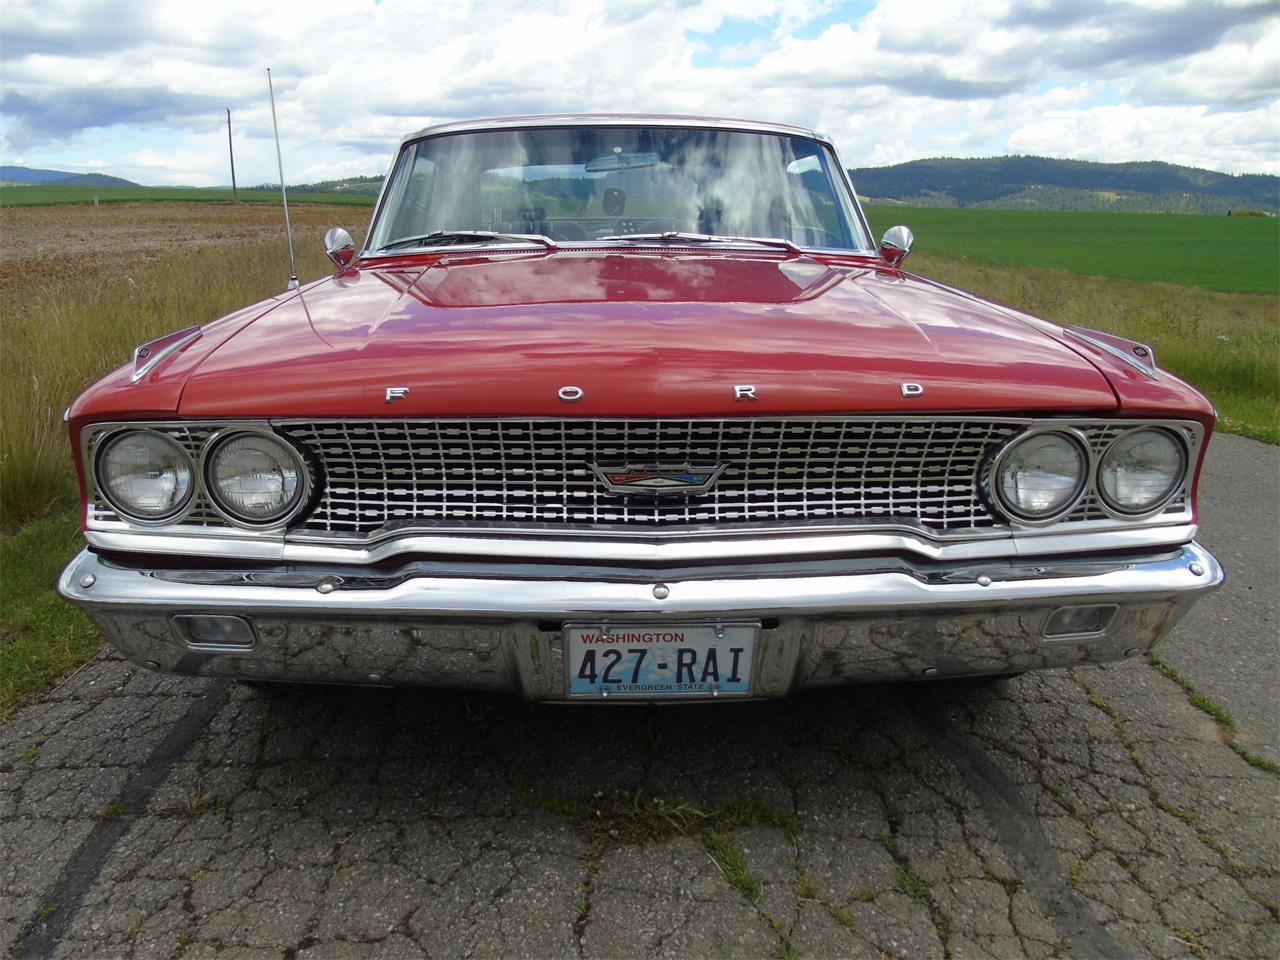 1963 Ford Galaxie 500 XL (CC-1356057) for sale in Spokane, Washington